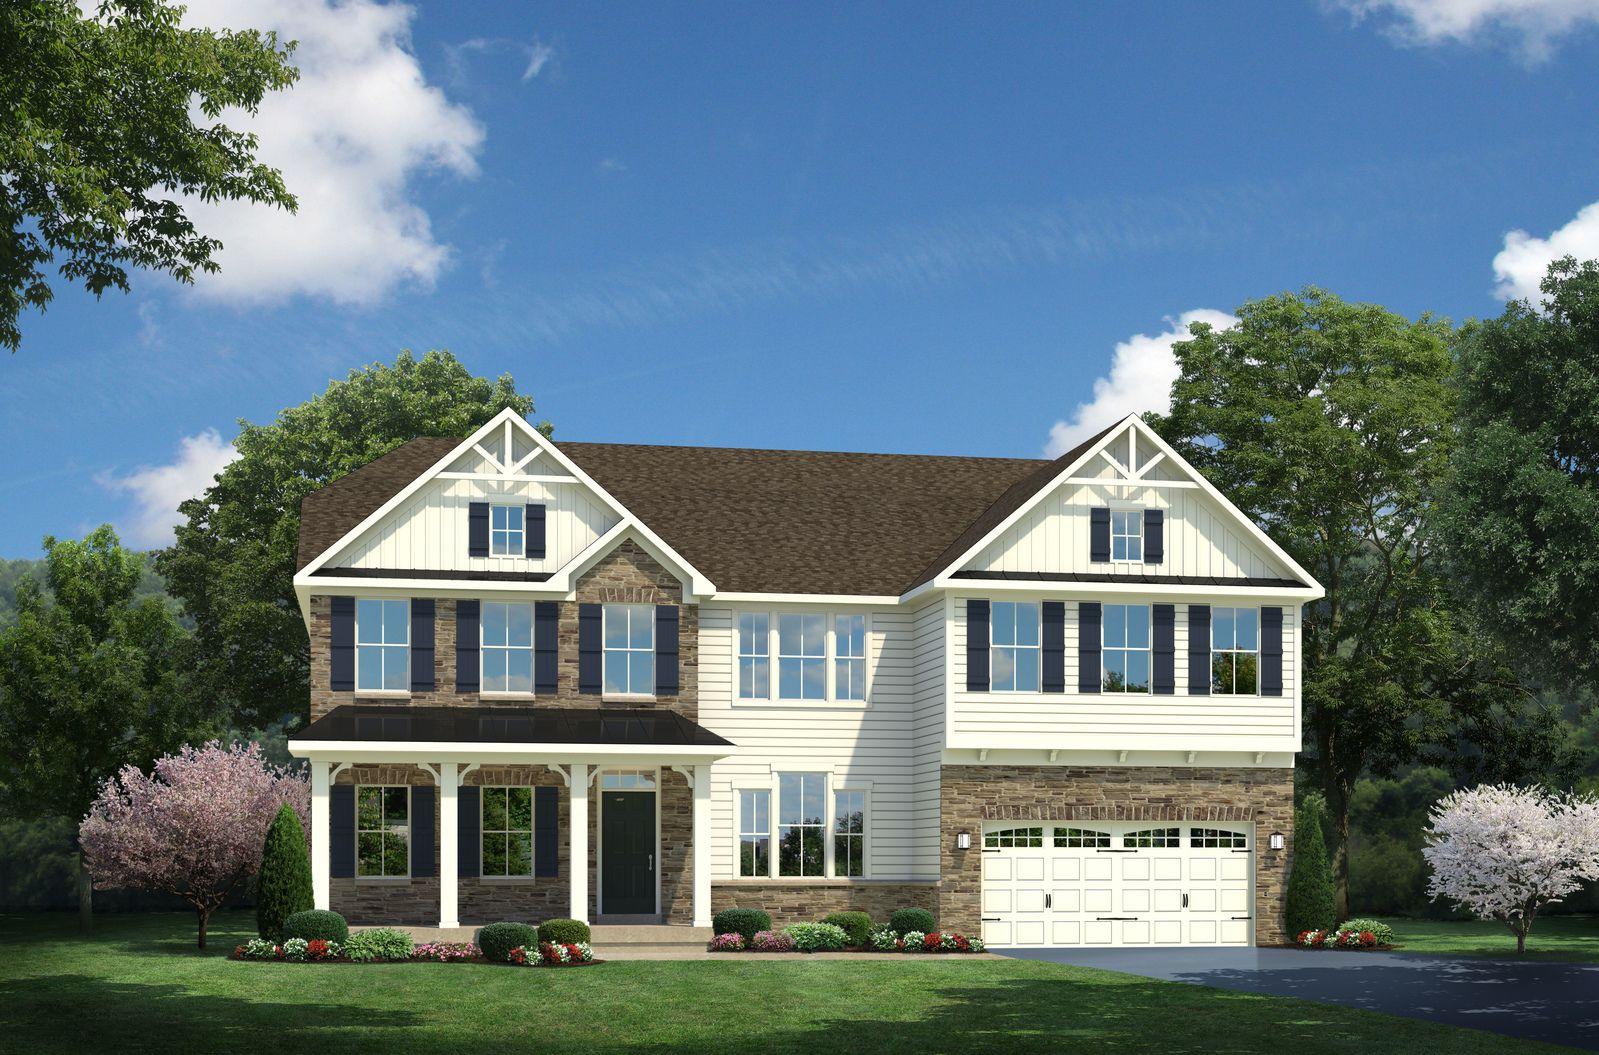 7807 Warrenton Chase Drive, Warrenton, VA Homes & Land - Real Estate